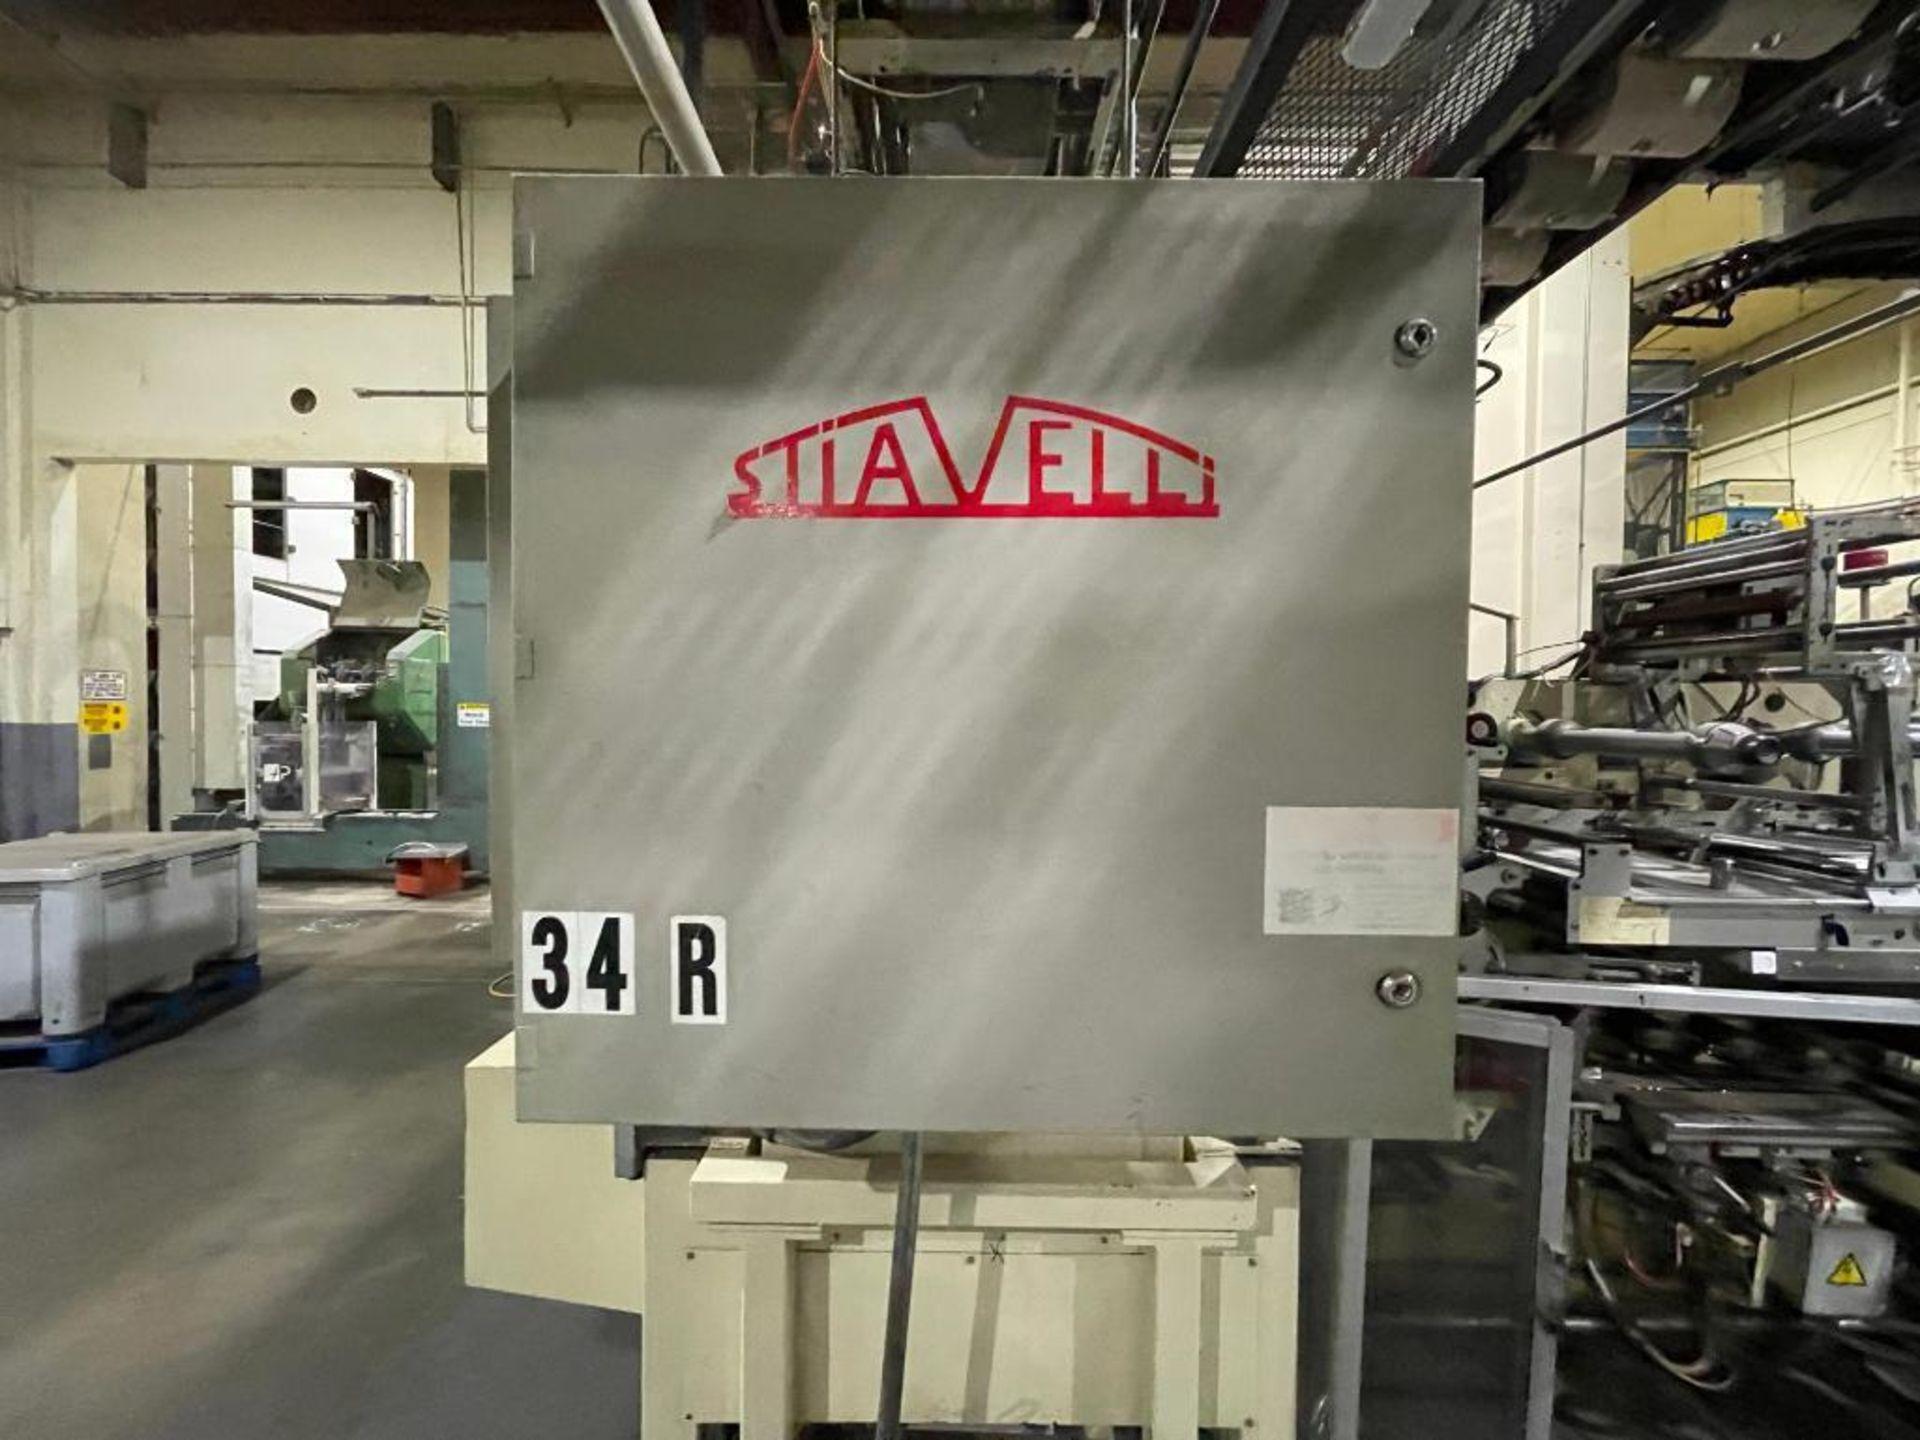 Stiavelli long goods horizontal flow wrapper - Image 28 of 53